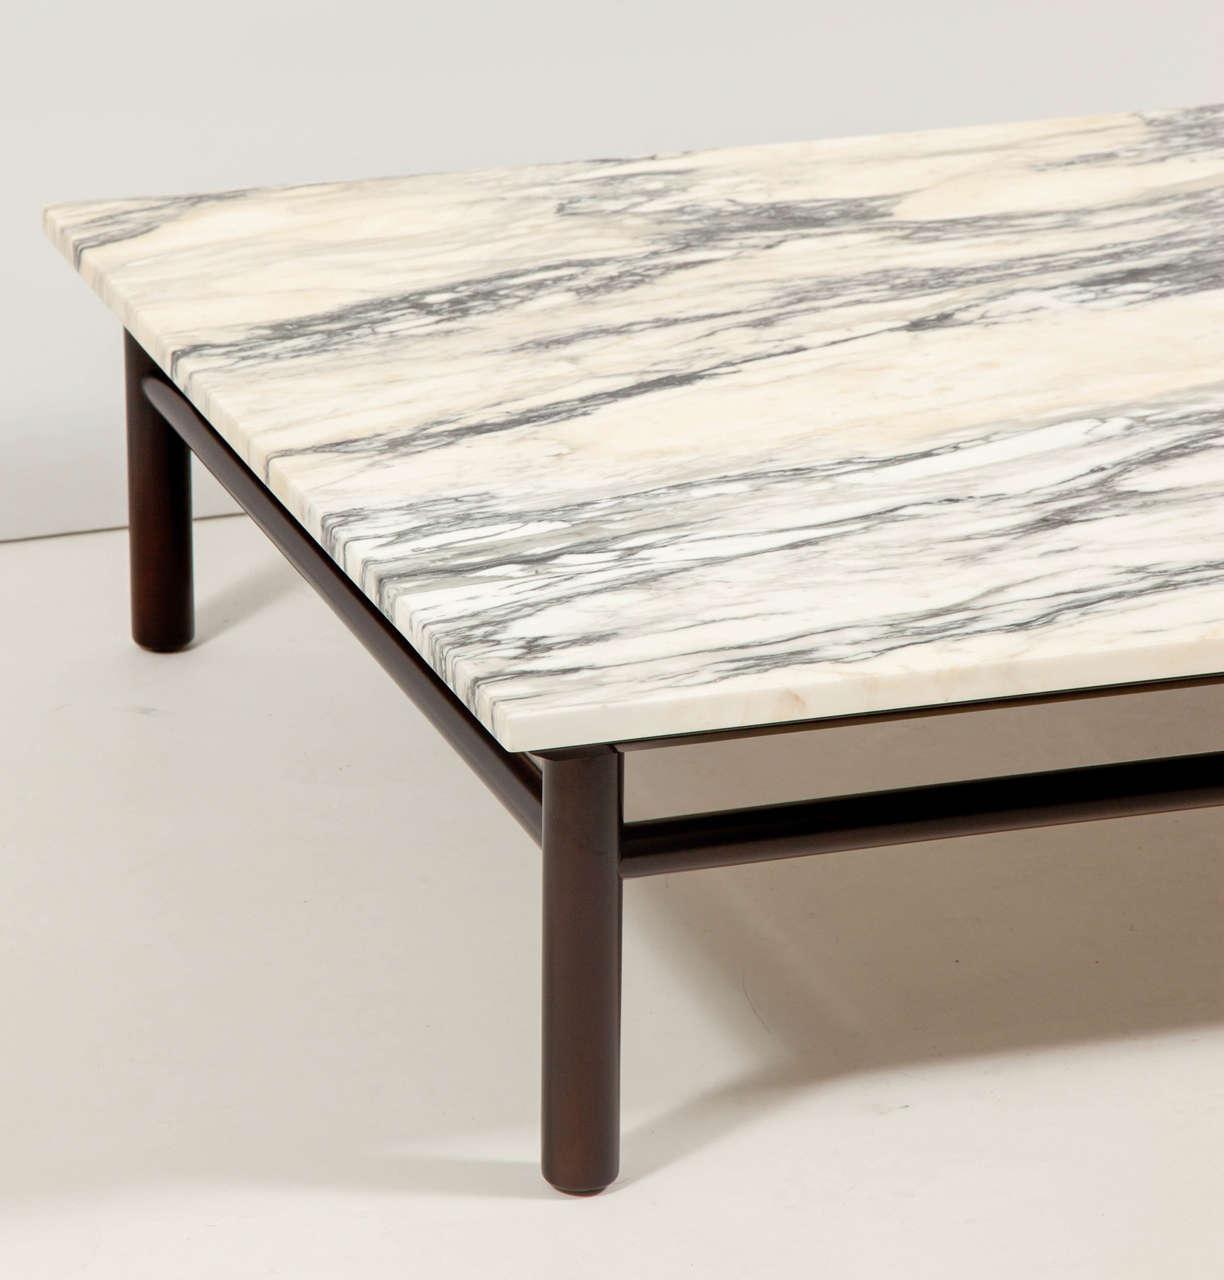 Robsjohn-Gibbings Walnut and Marble Coffee Table 4